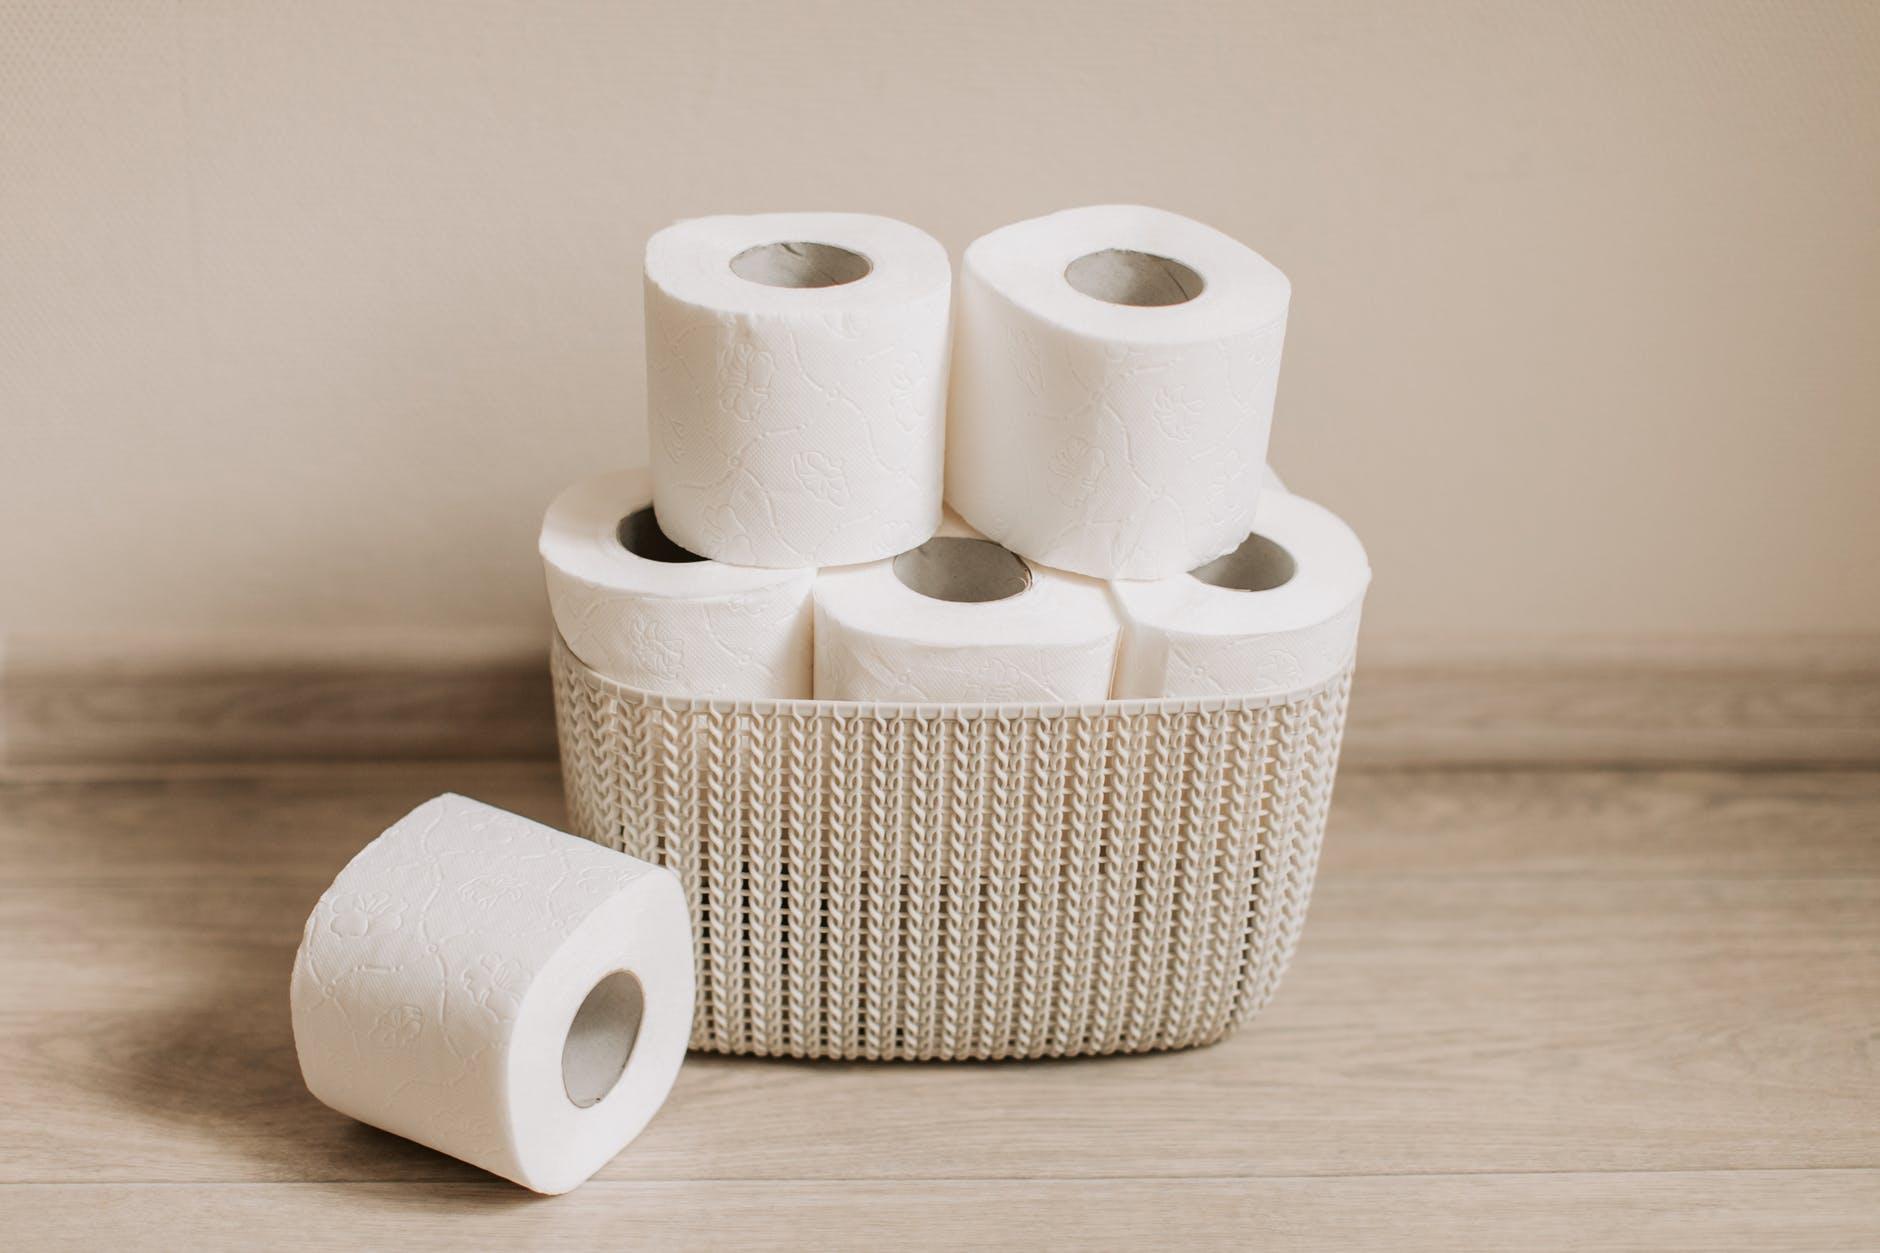 toilet paper rolls on basket